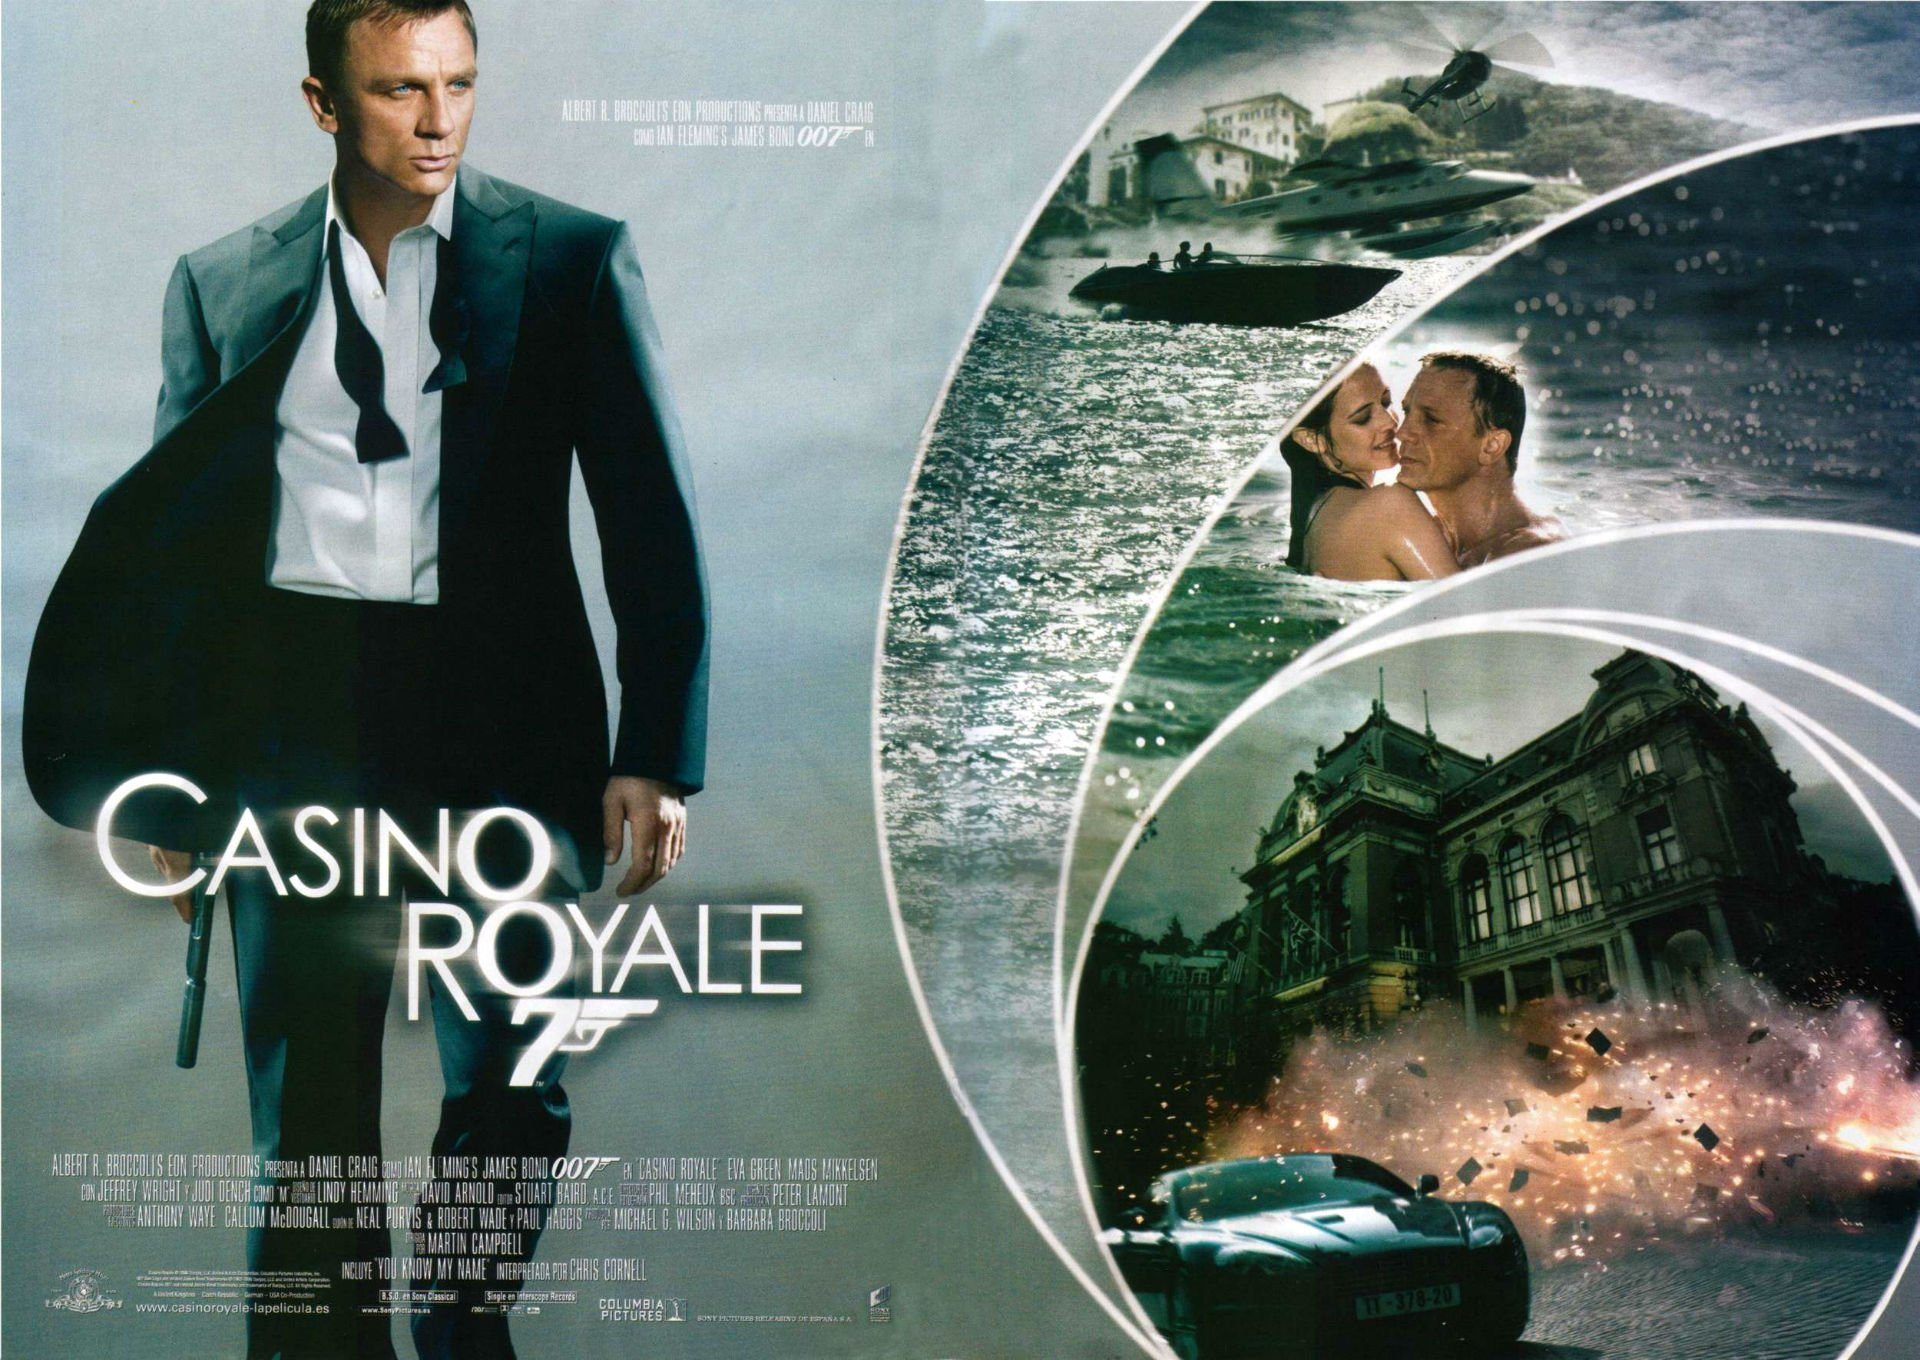 casino royale wallpaper poster - photo #12